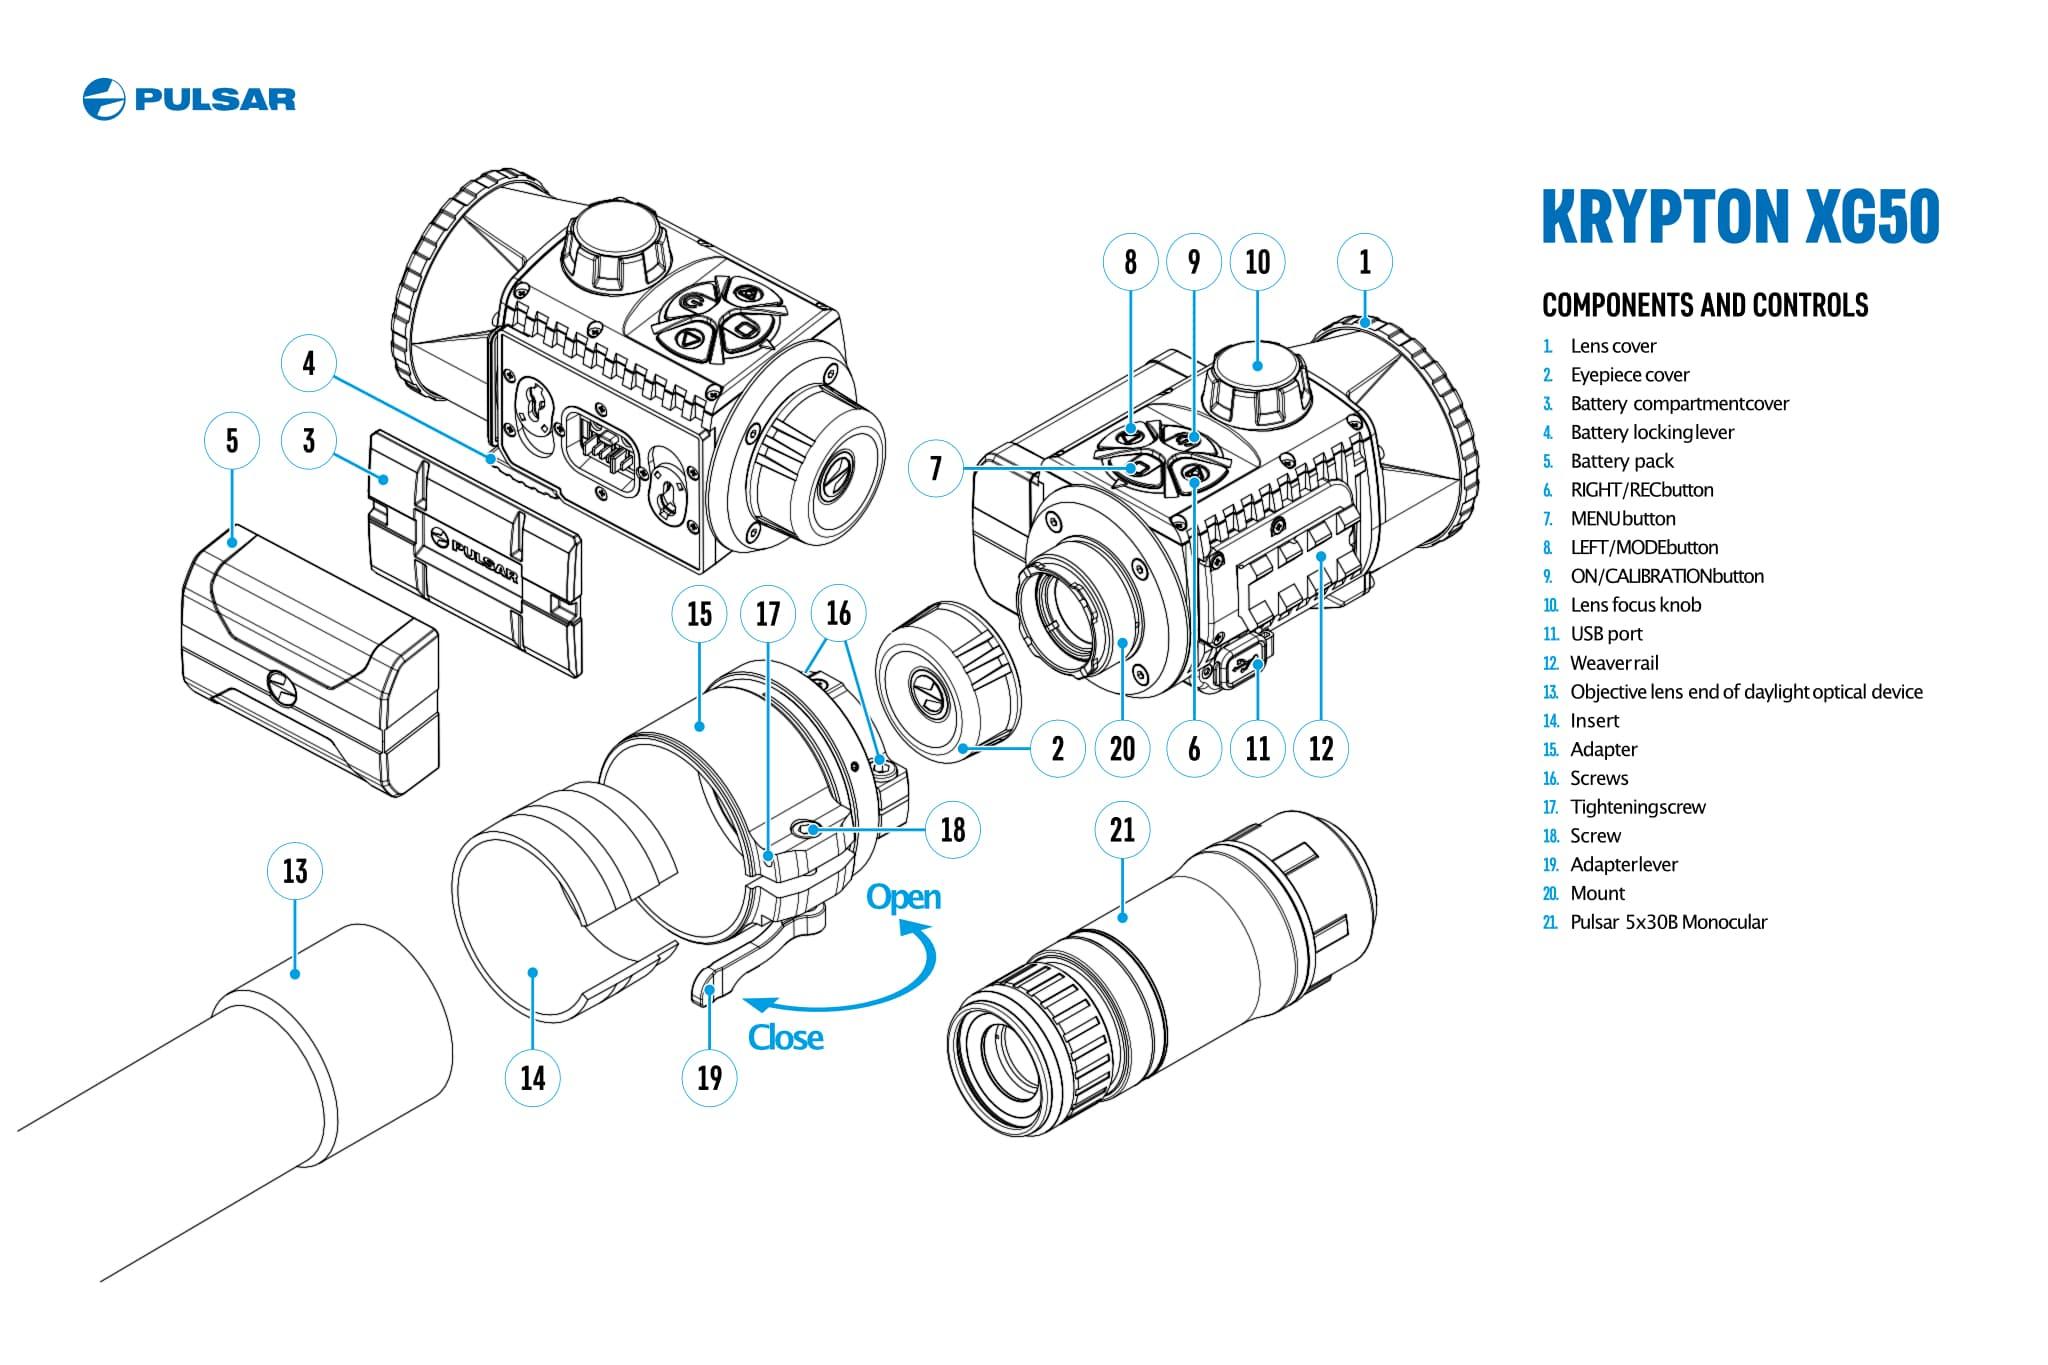 Termokaamera Pulsar Krypton XG50